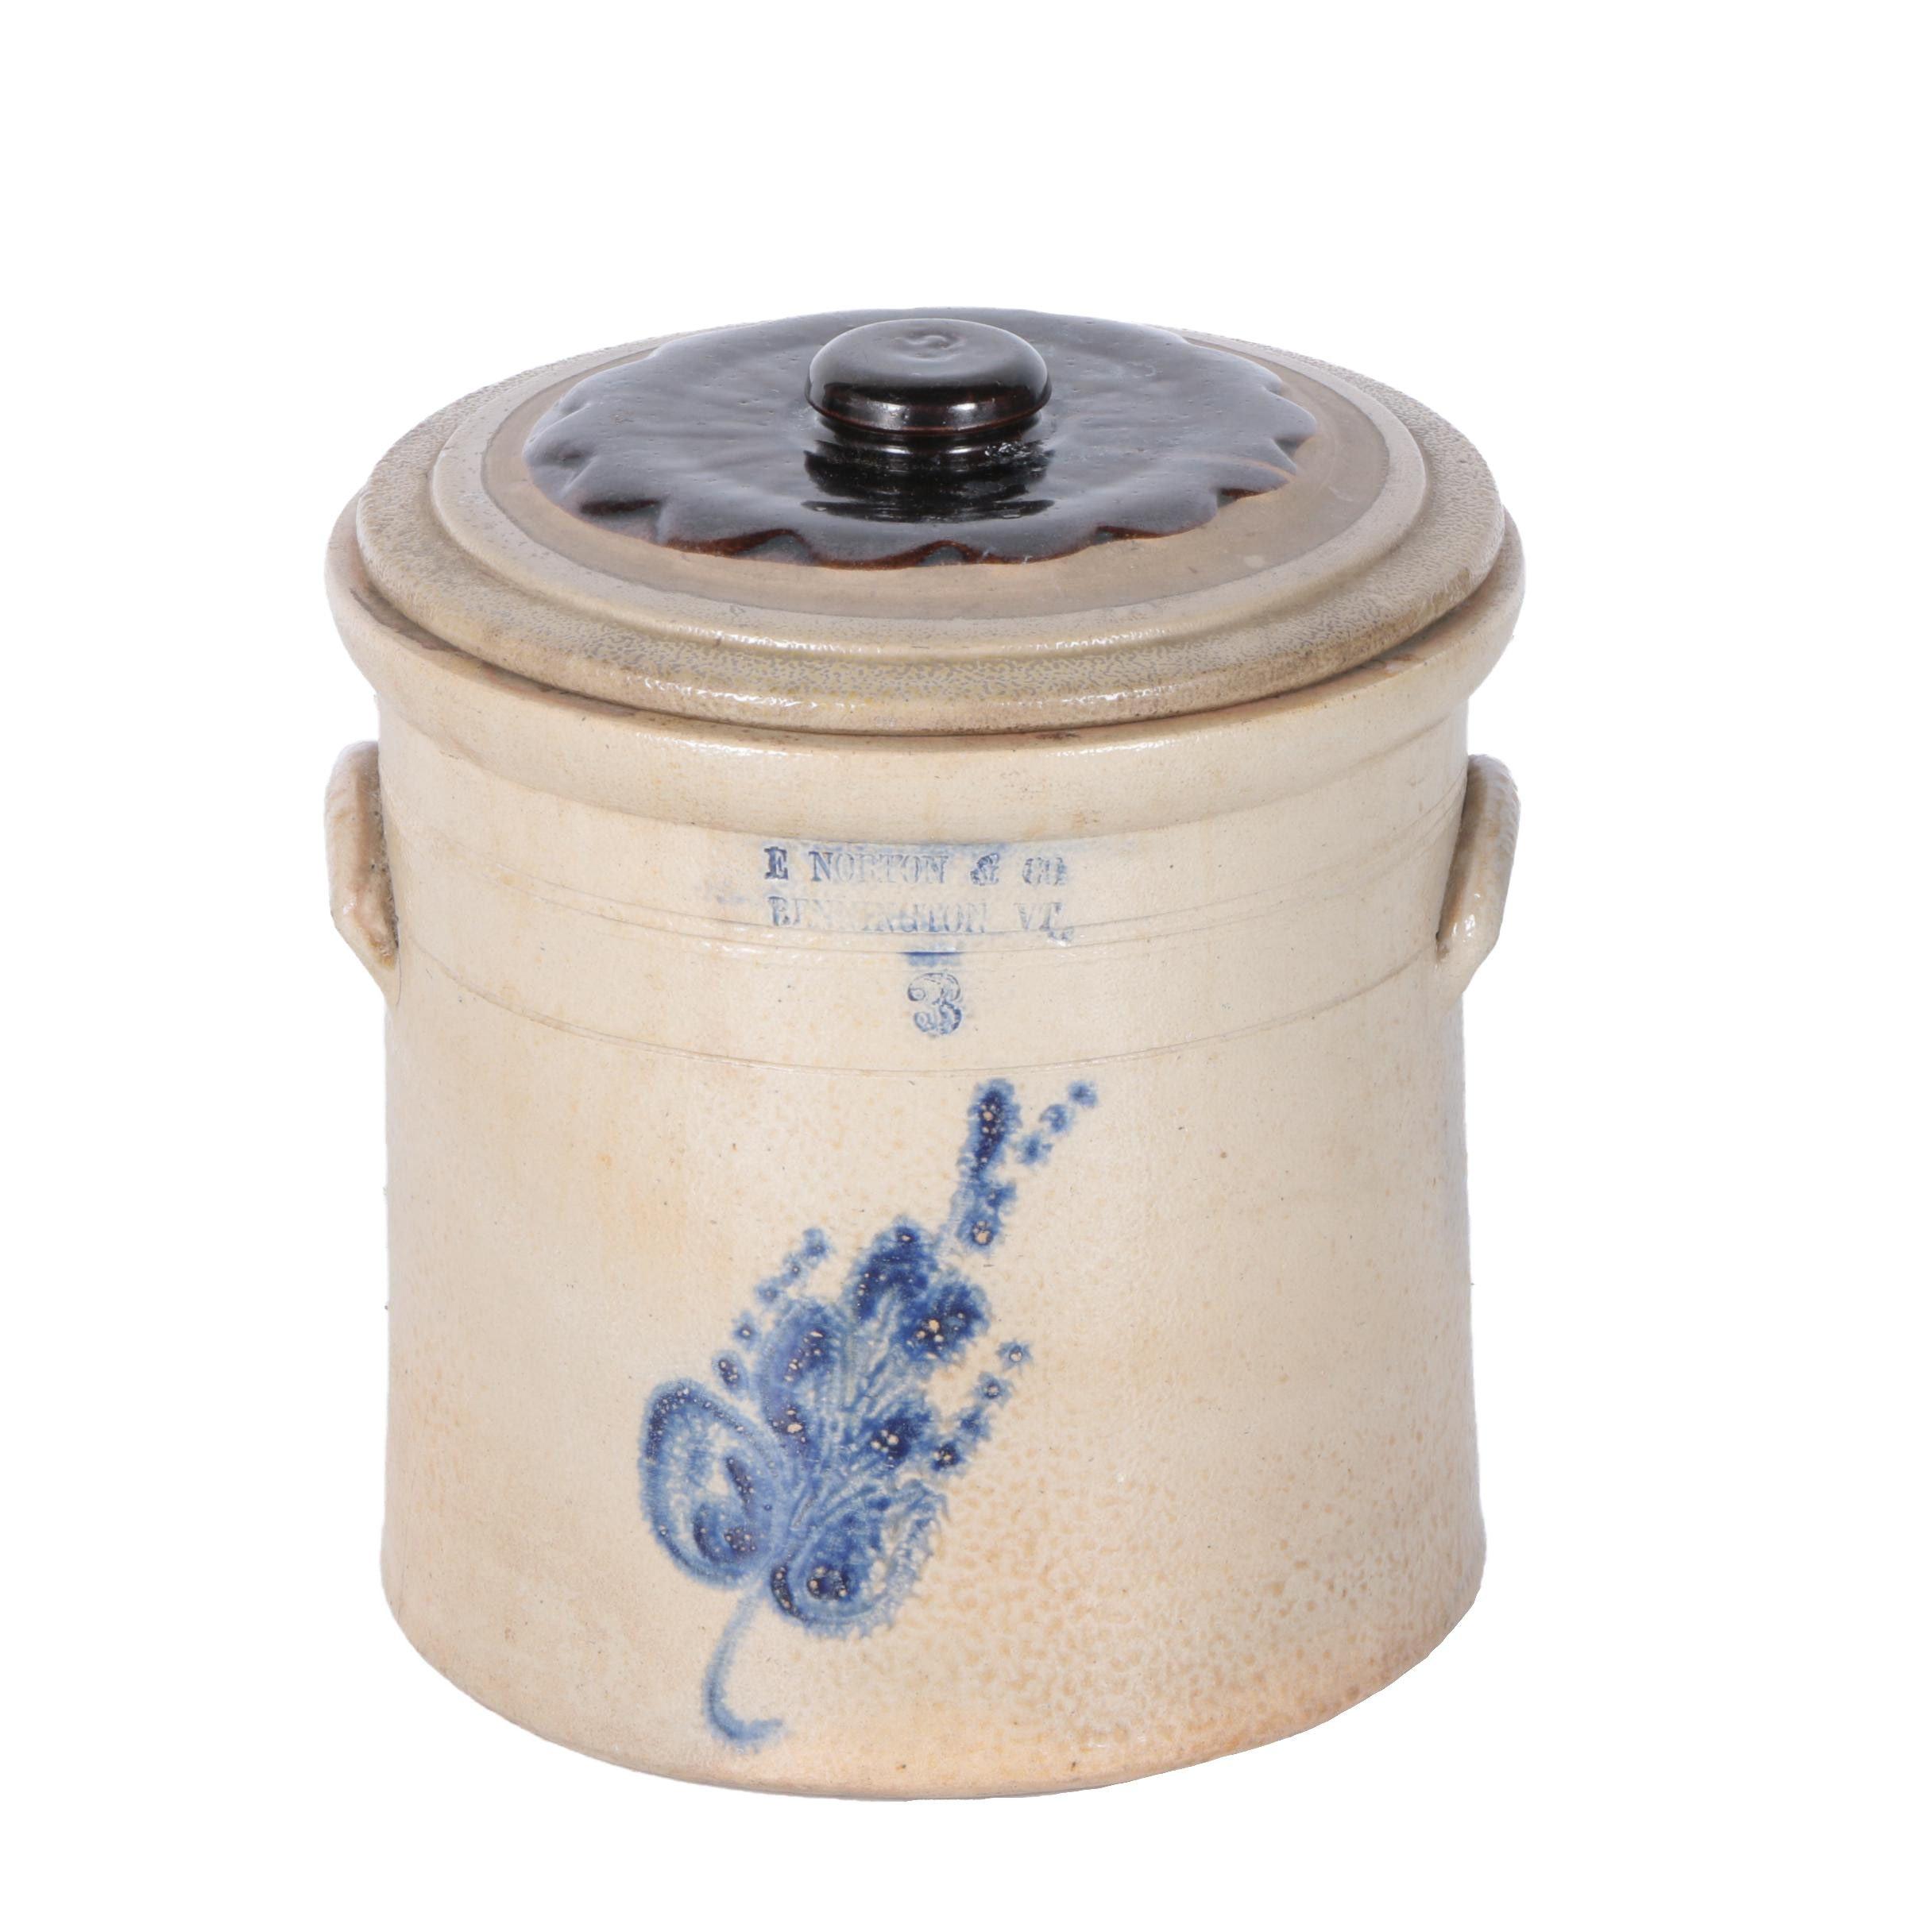 Antique E. Norton & Co. Bennington Vermont Lidded Stoneware Crock